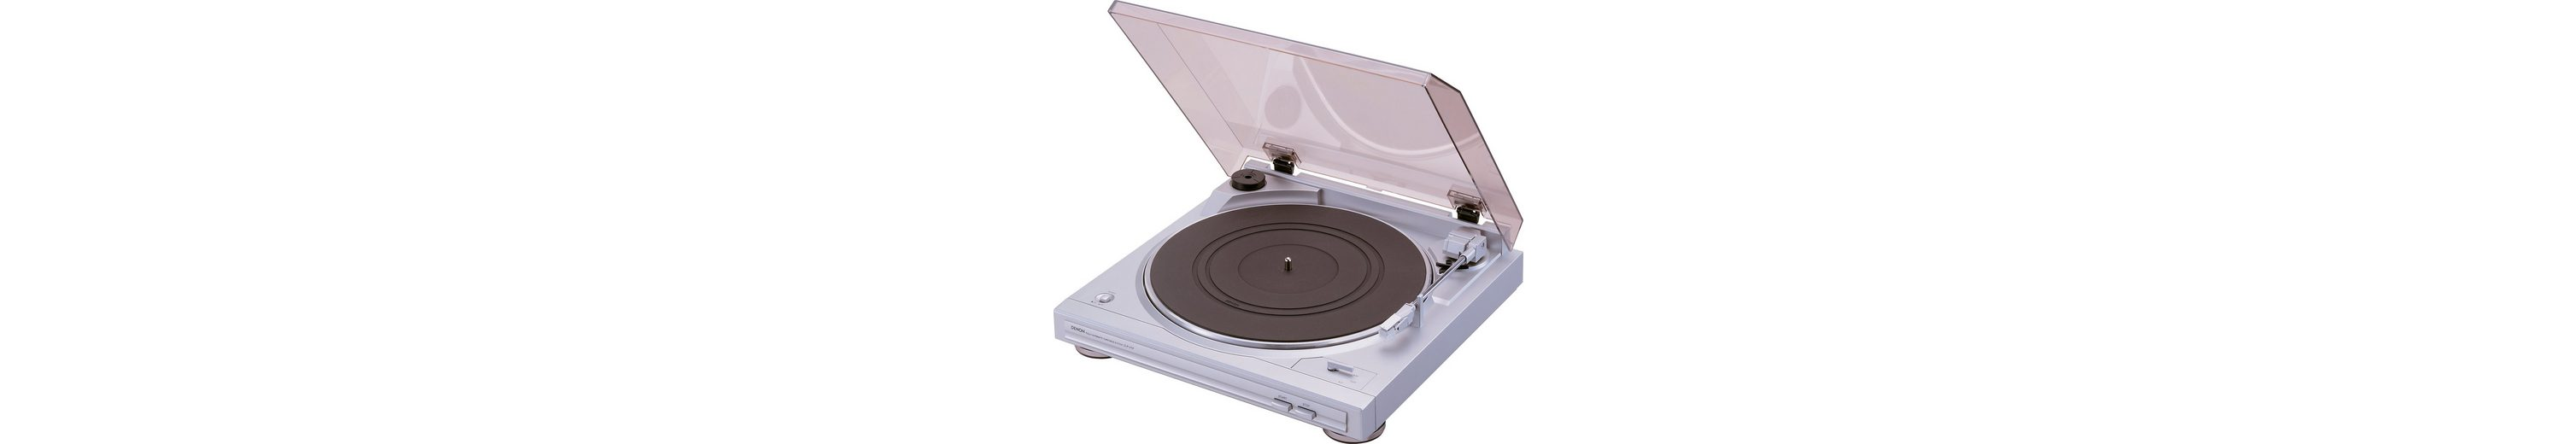 Denon DP29F I Plattenspieler